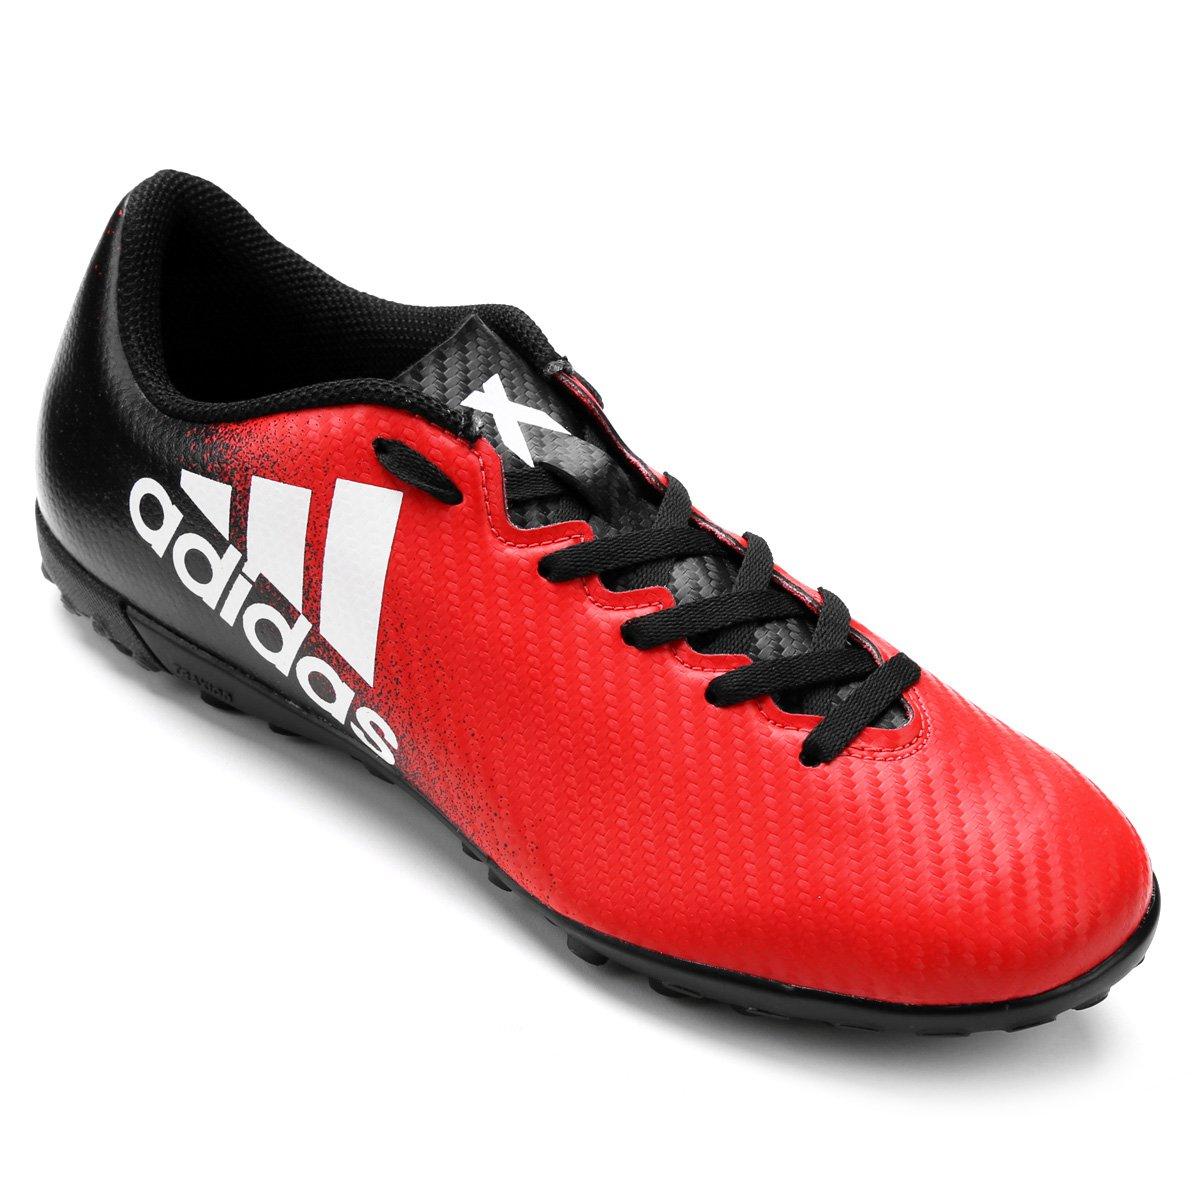 cd47a5176ad Chuteira Society Adidas X 16 4 TF Masculina - Compre Agora